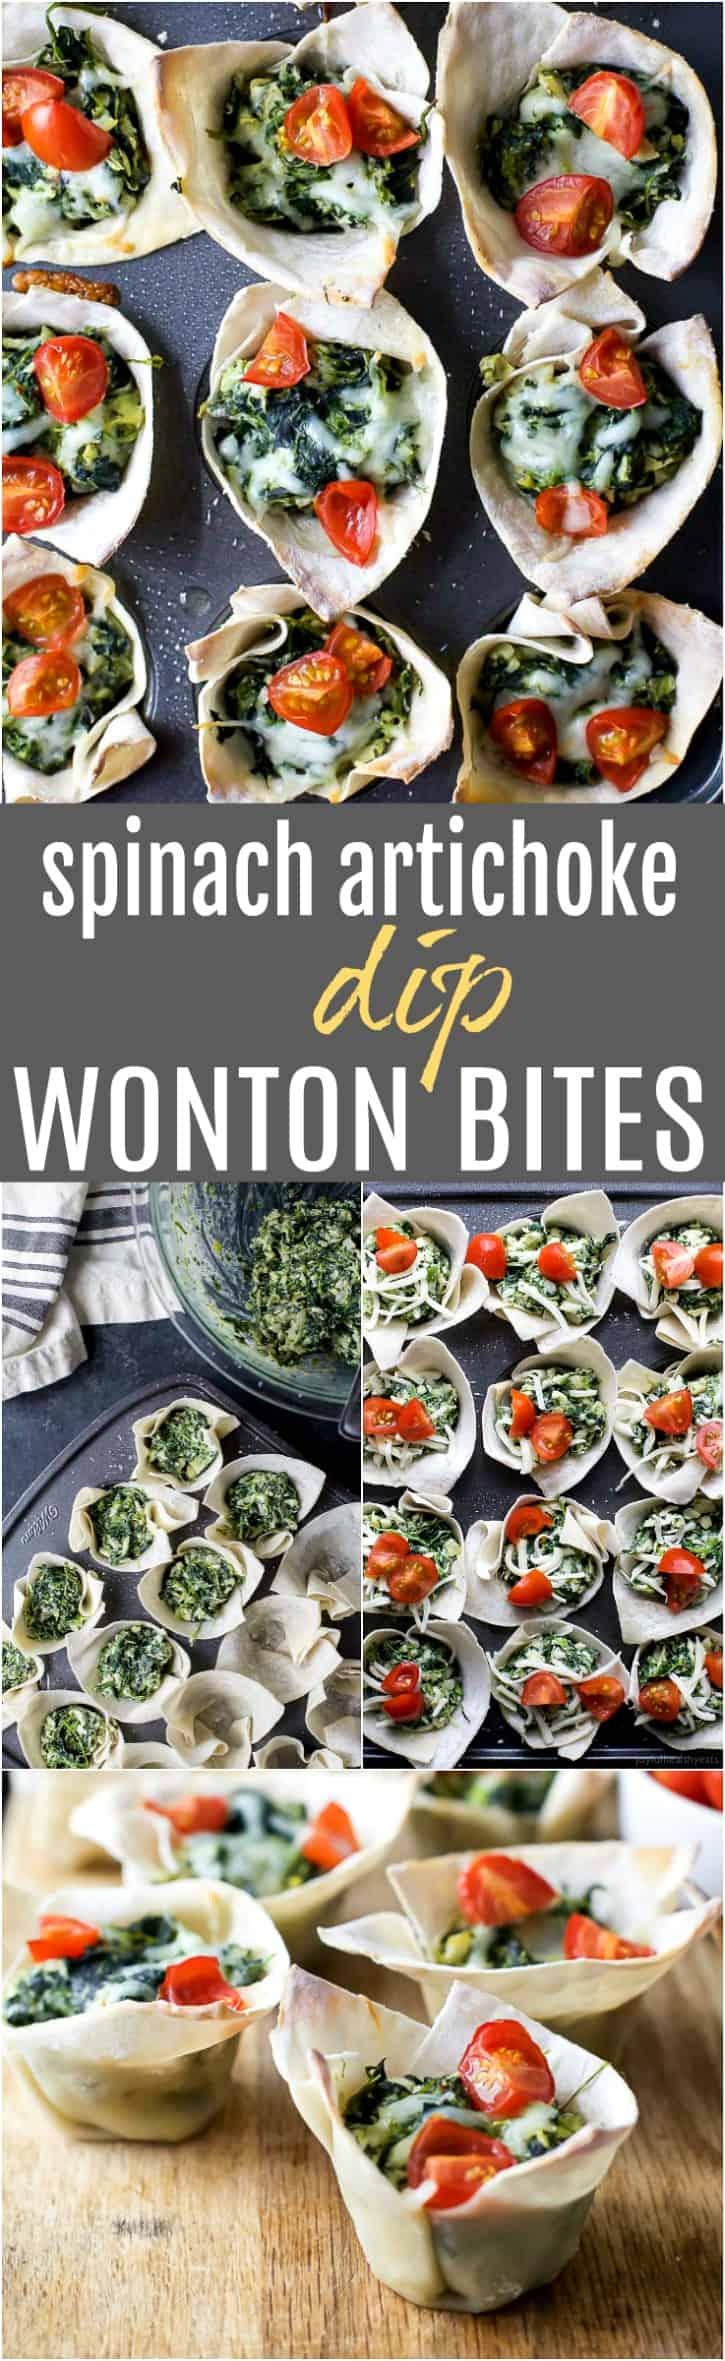 Easy Baked Wonton Bites Recipe